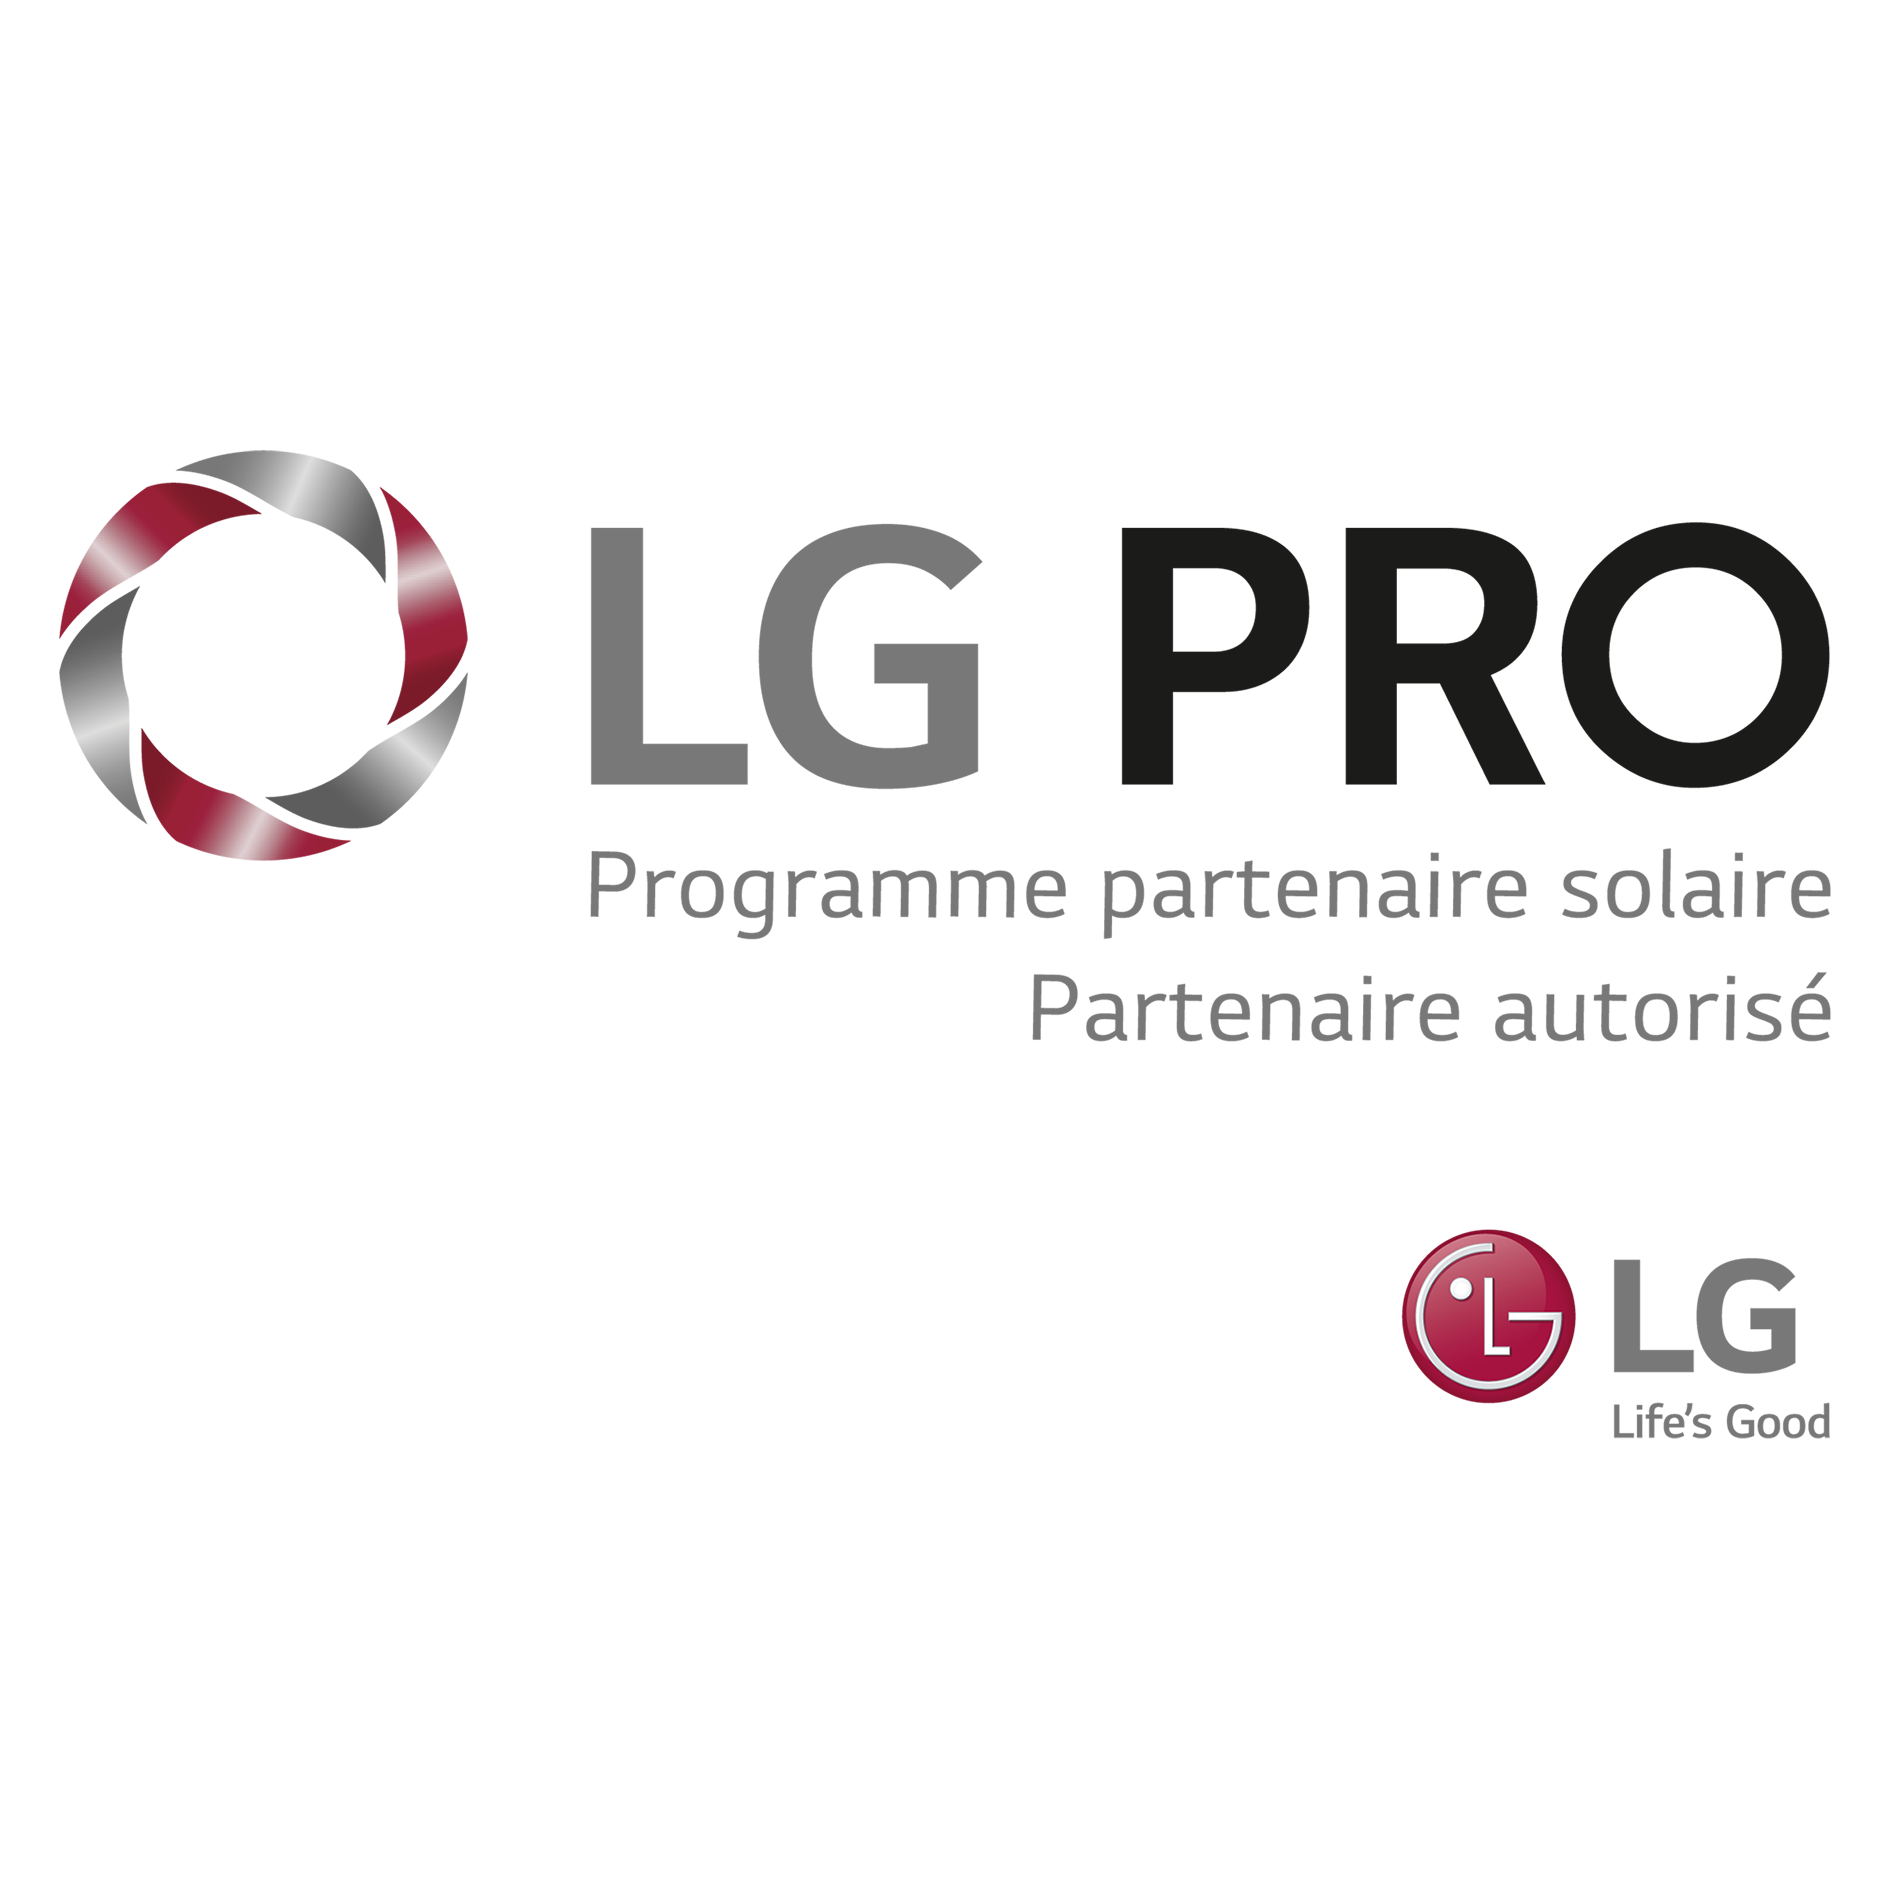 ttps://www.lg.com/fr/professionnels/solar